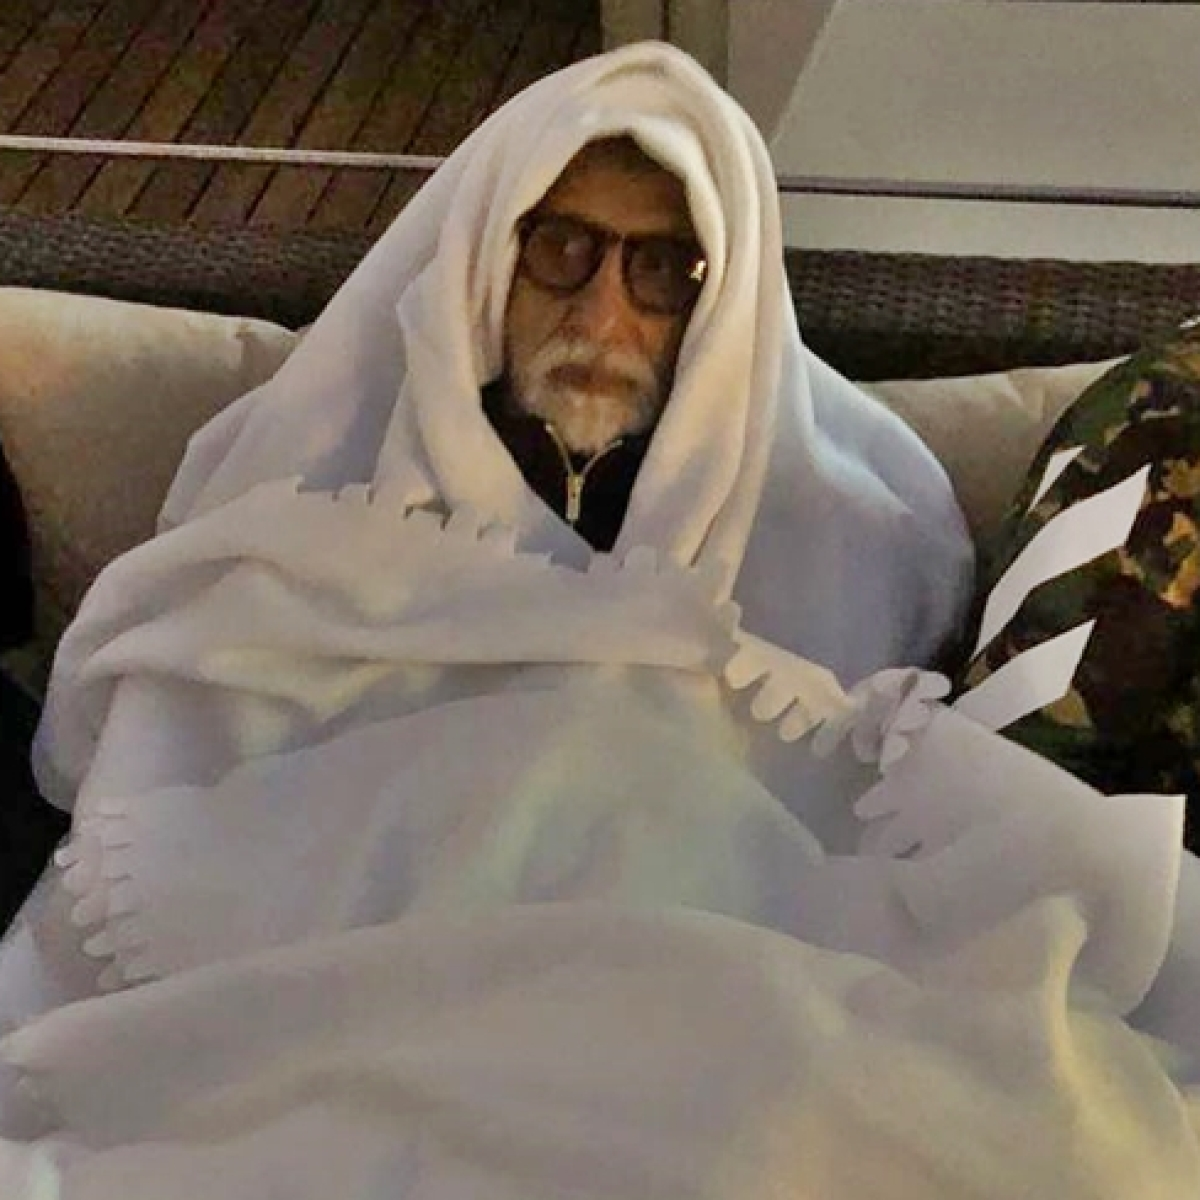 Fake TikTok video on Amitabh Bachchan's 'death' draws fury on social media